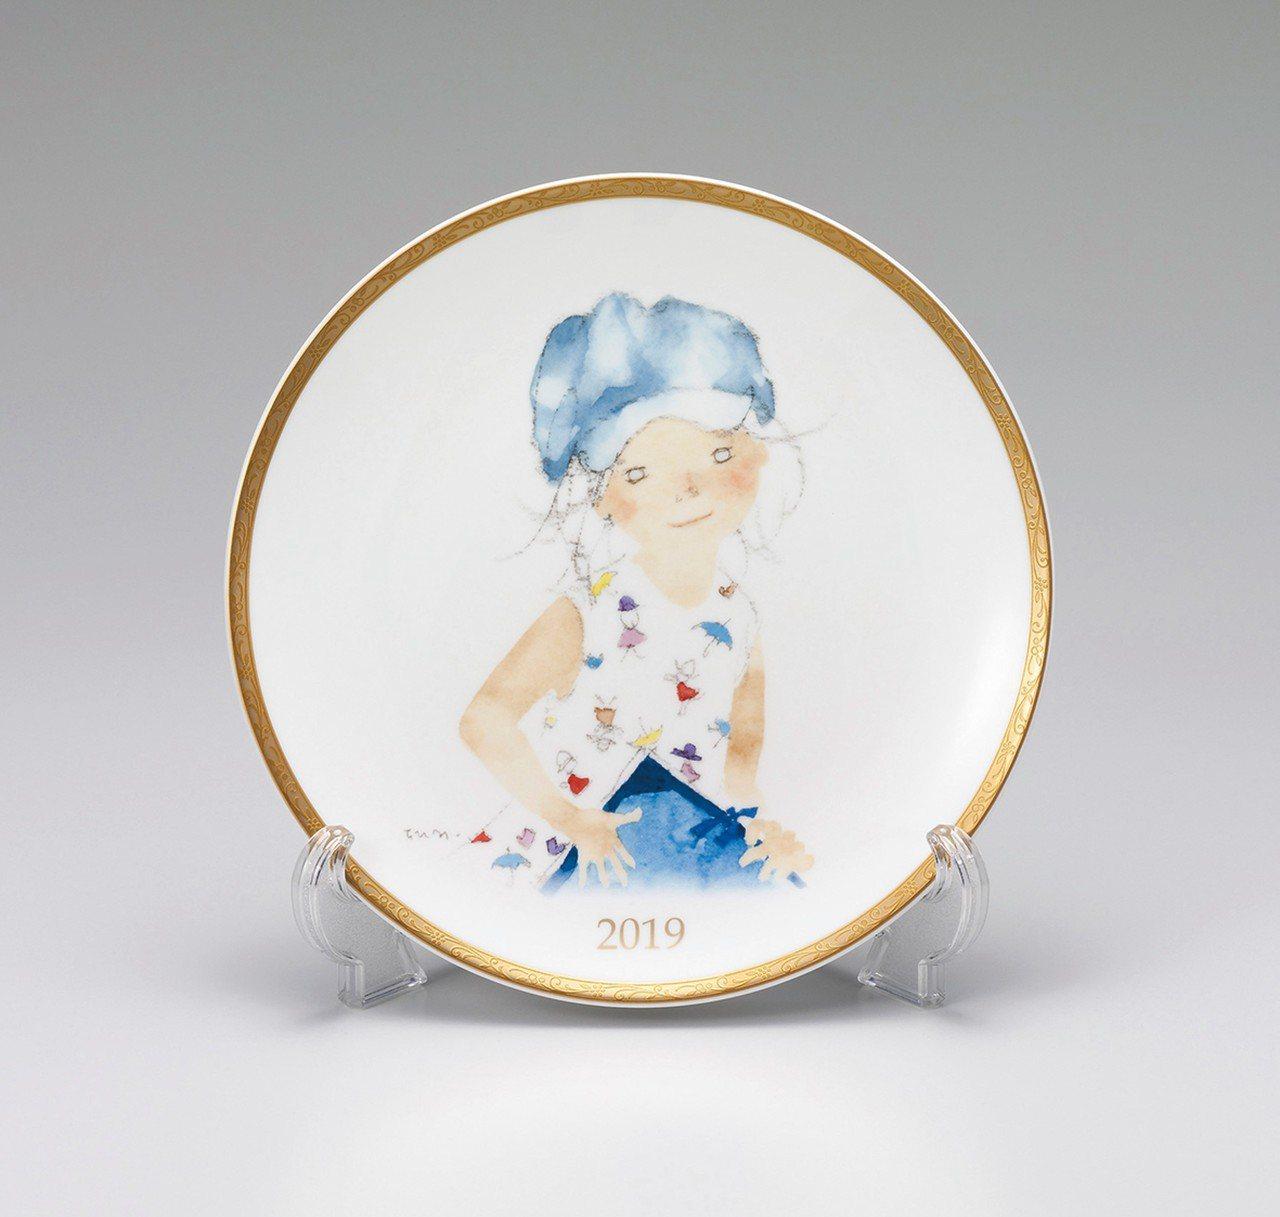 NARUMI的2019年度盤是一個戴著藍色帽子的可愛女孩,手裡拿著一本素描繪本,...